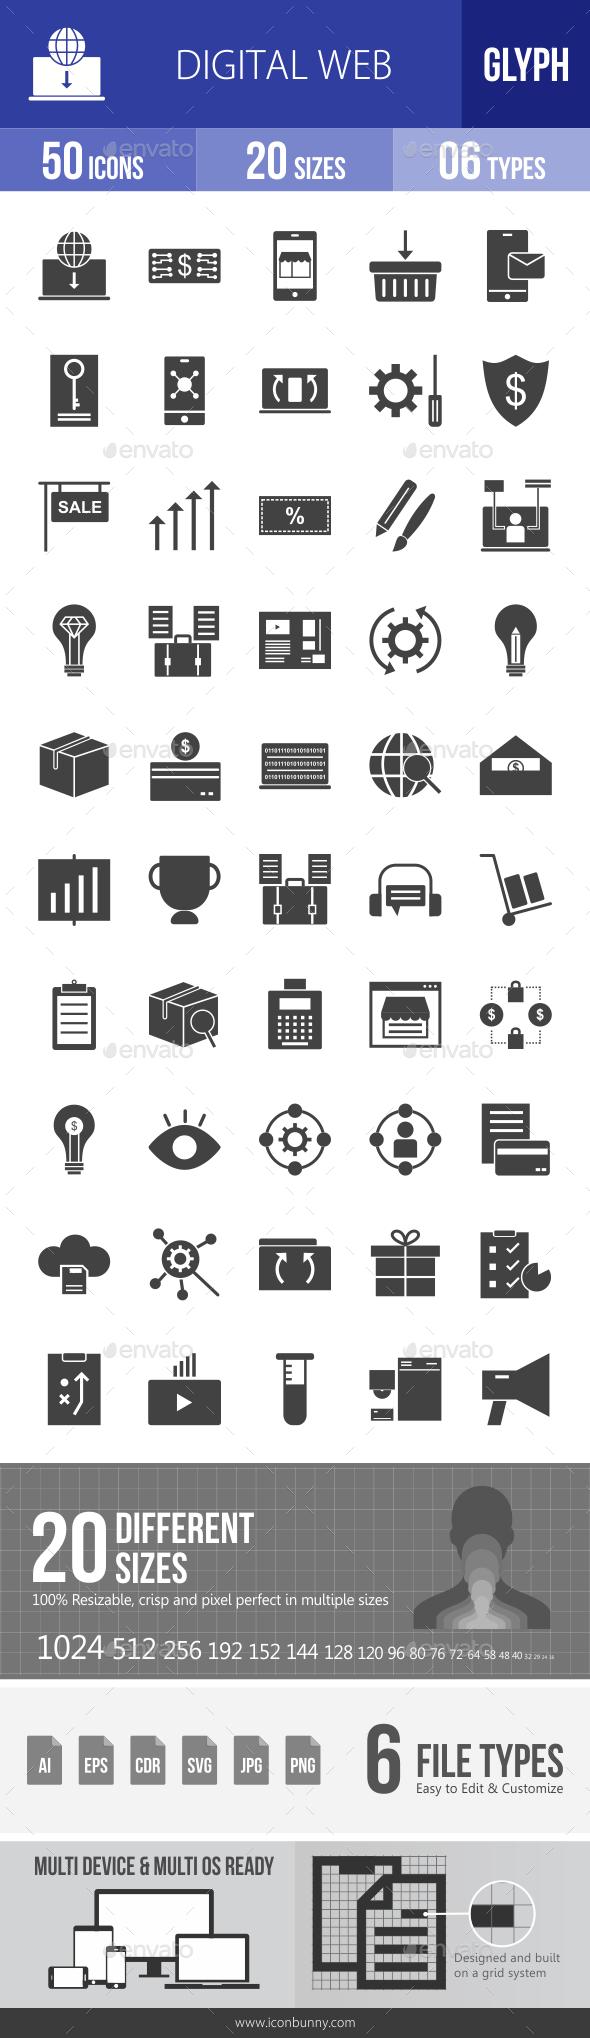 Wireless icon line iconset iconsmind - Digital Web Glyph Icons